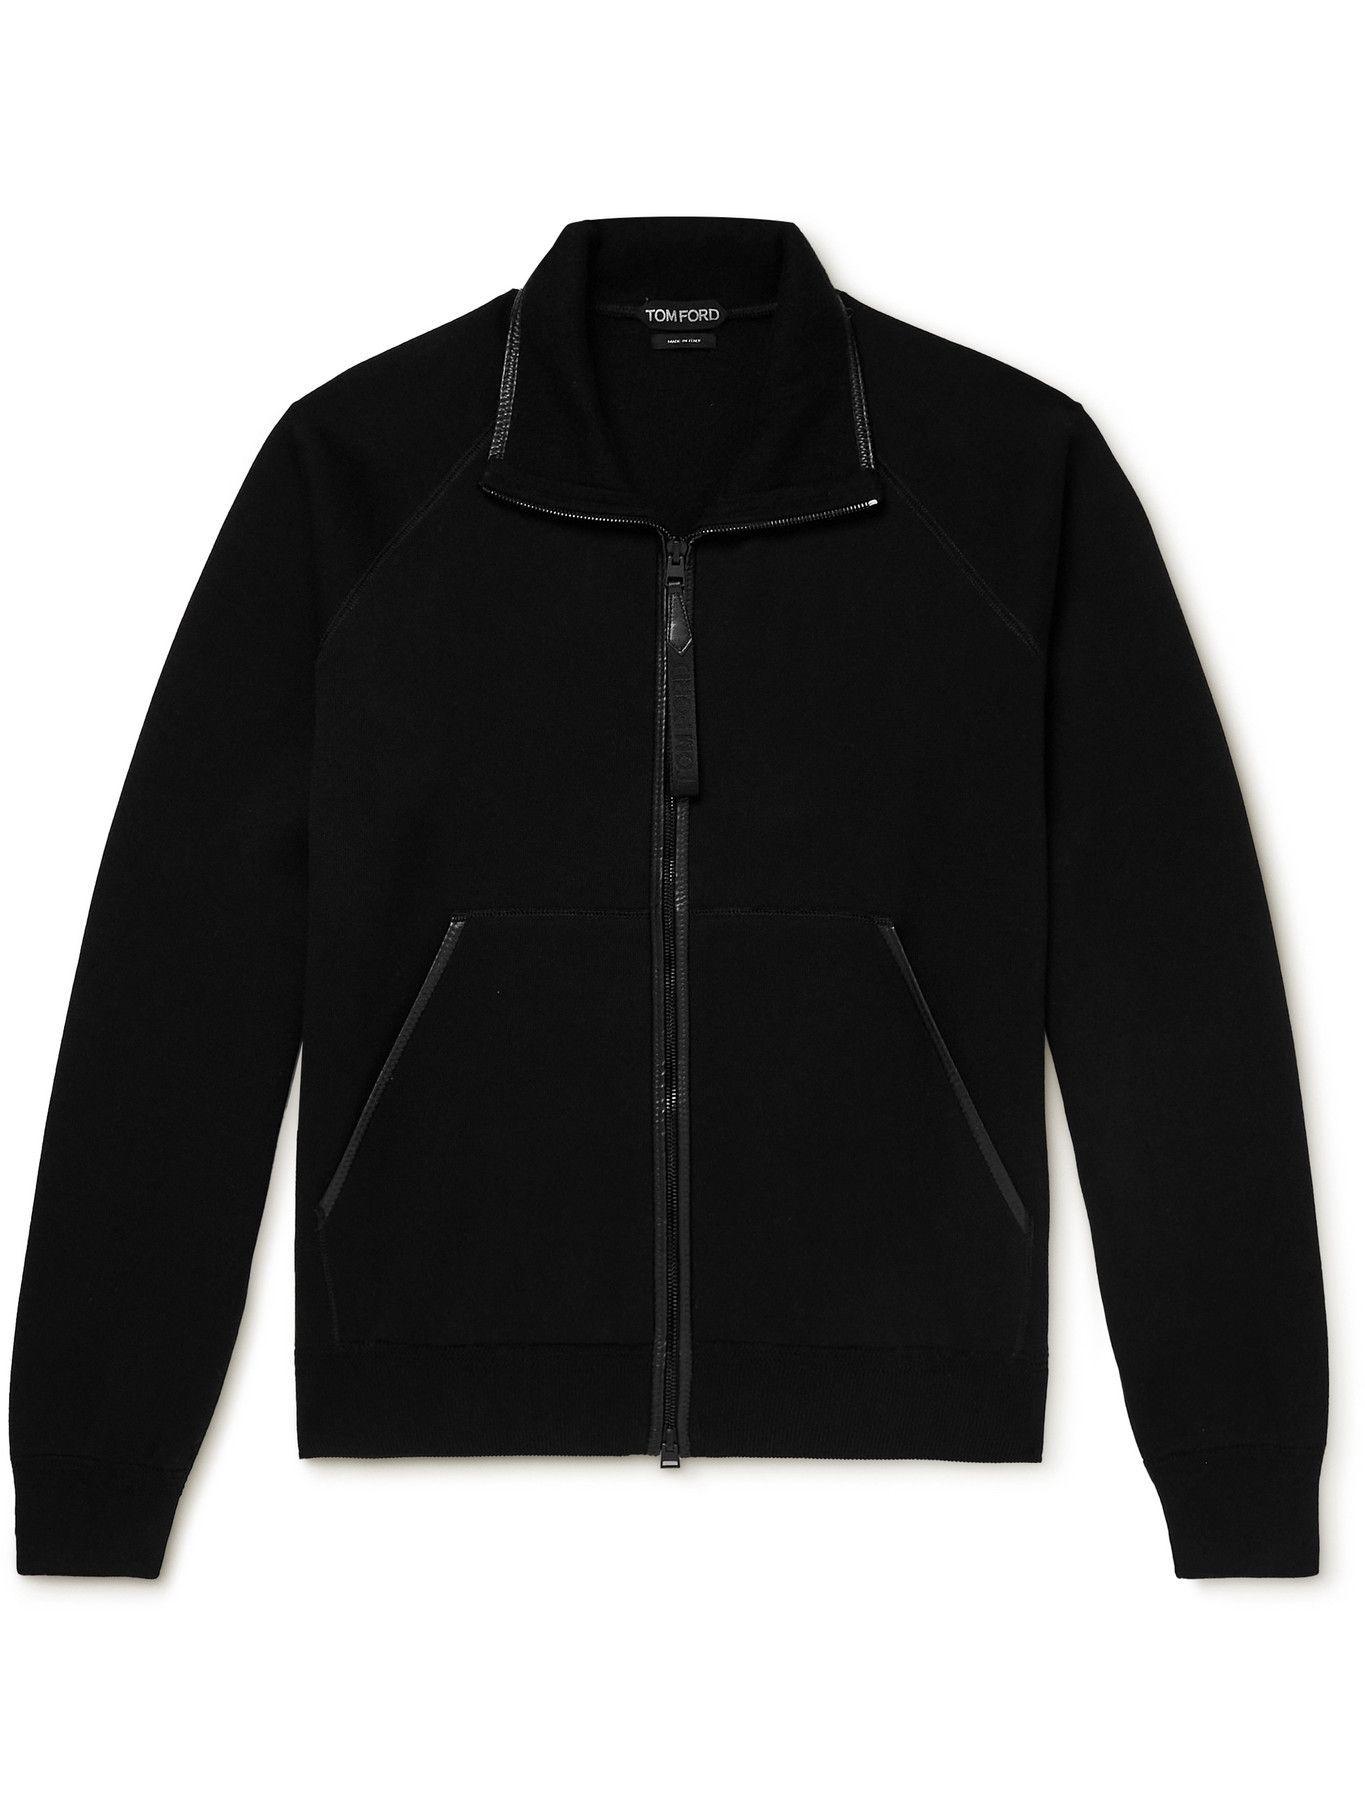 Photo: TOM FORD - Leather-Trimmed Cotton-Blend Zip-Up Sweatshirt - Black